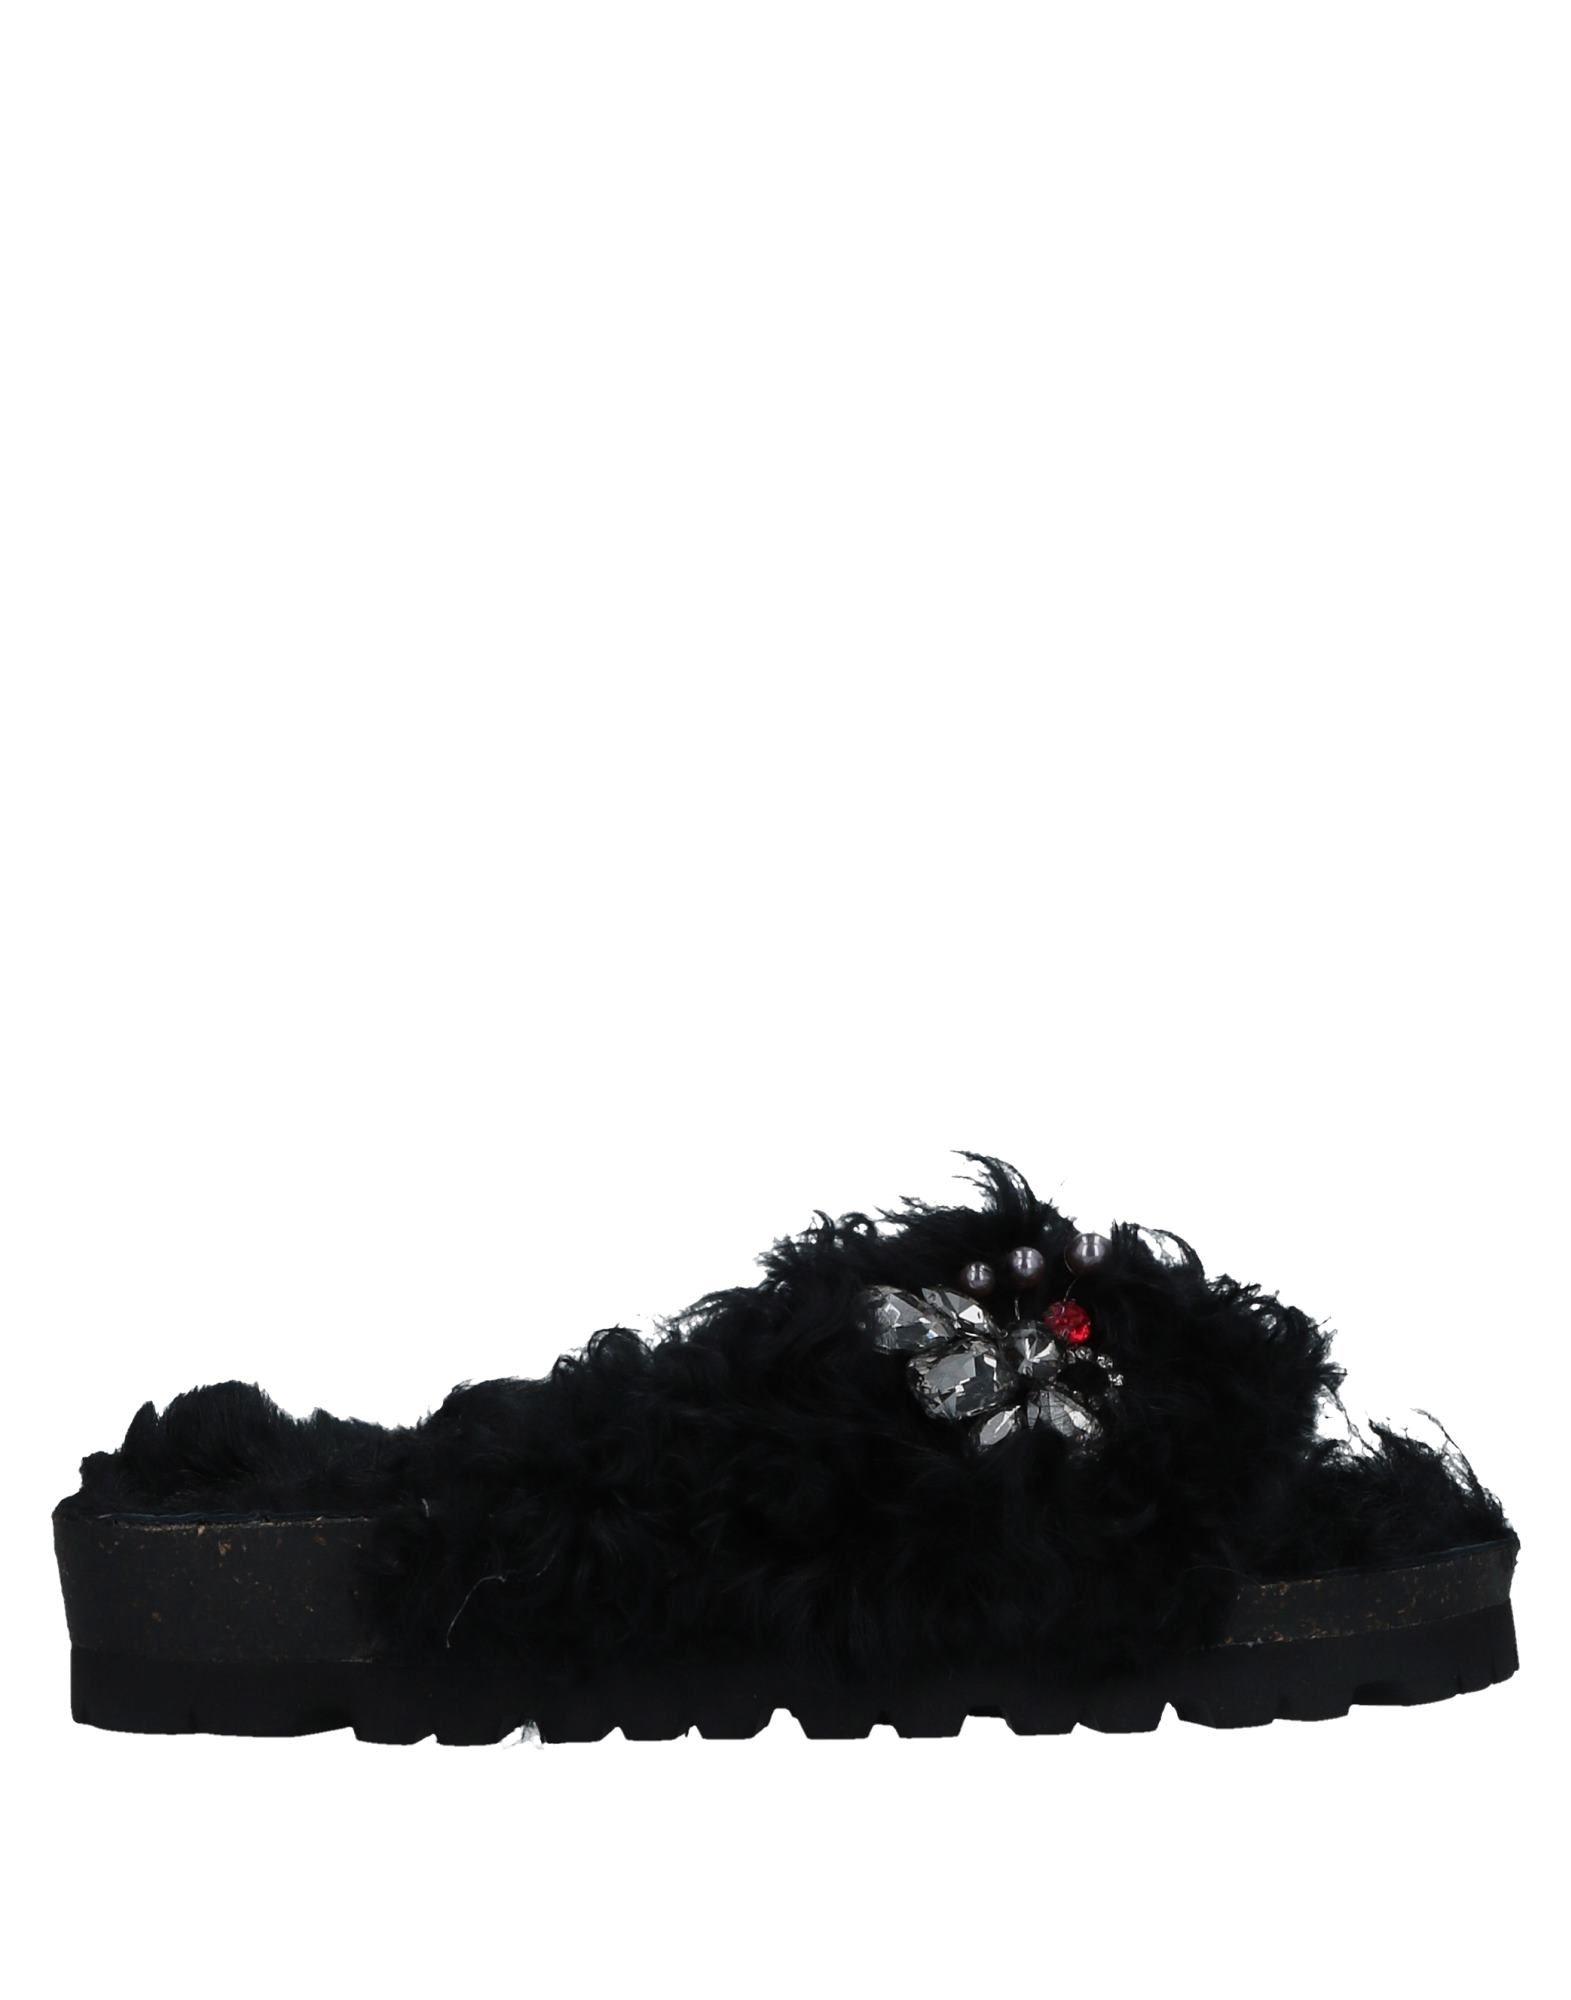 Roberto Della Croce Sandals - Women Women Women Roberto Della Croce Sandals online on  Canada - 11526383MJ 4d5854